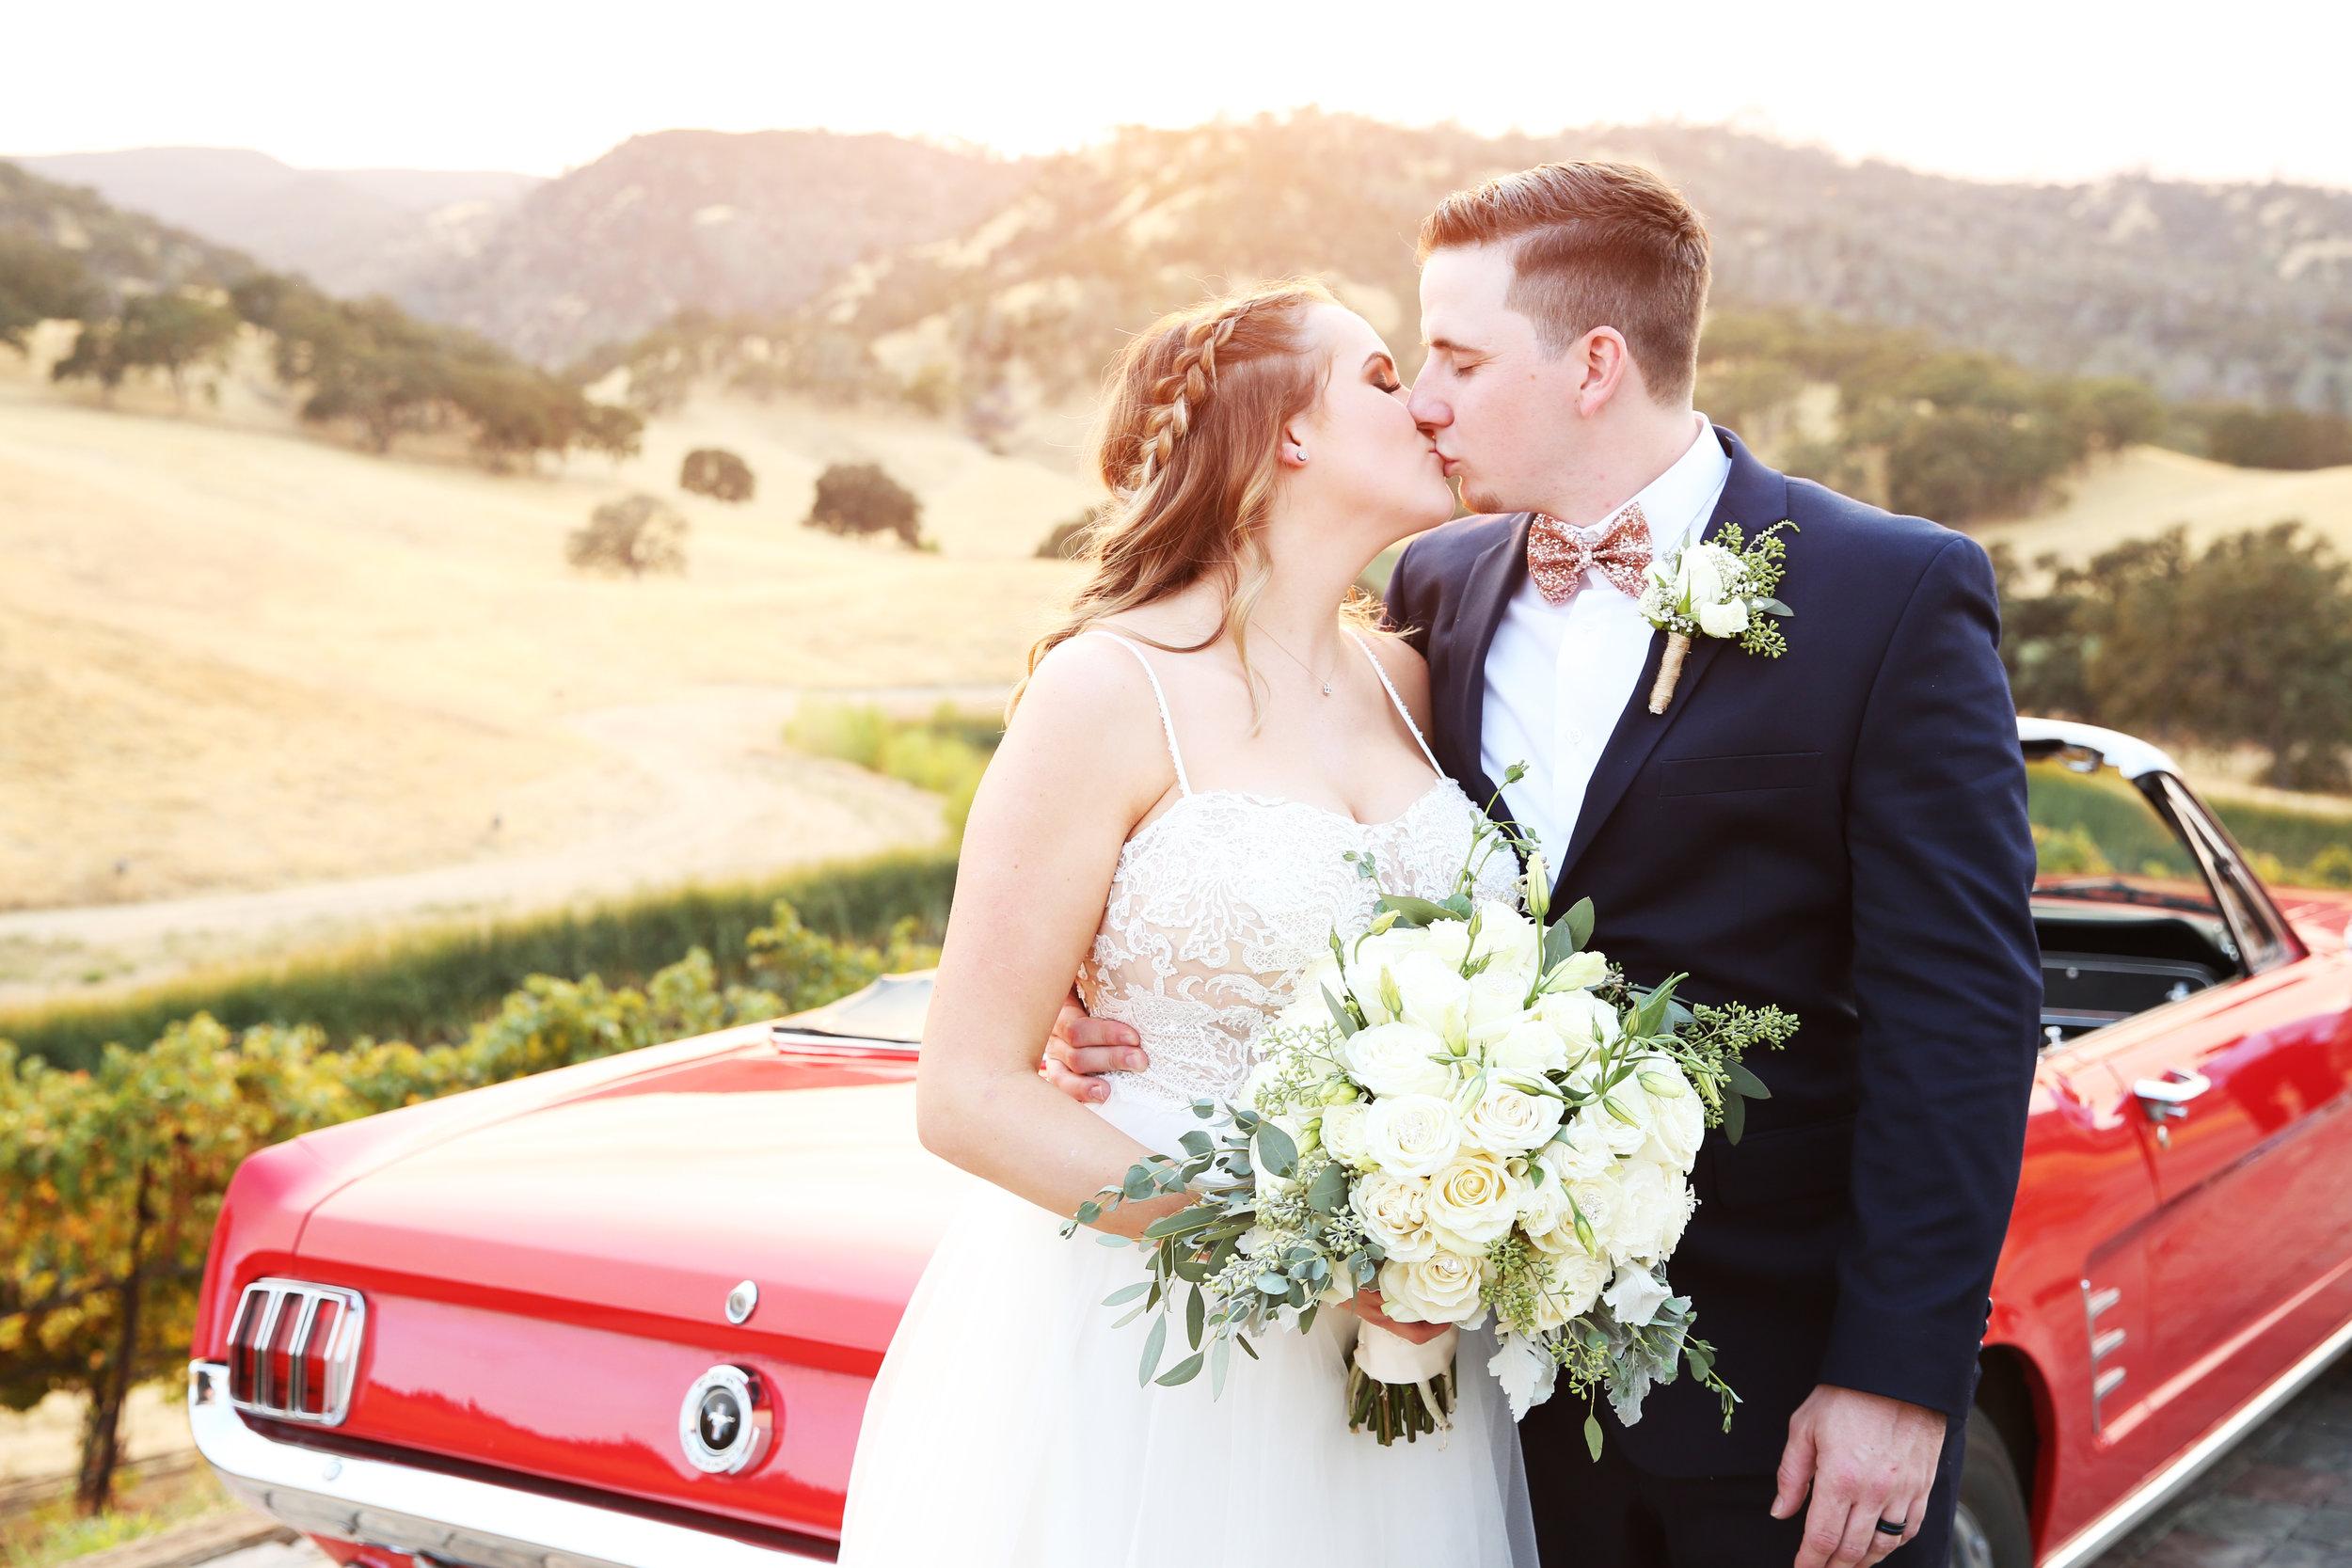 wedding photographer in sacramento.jpg